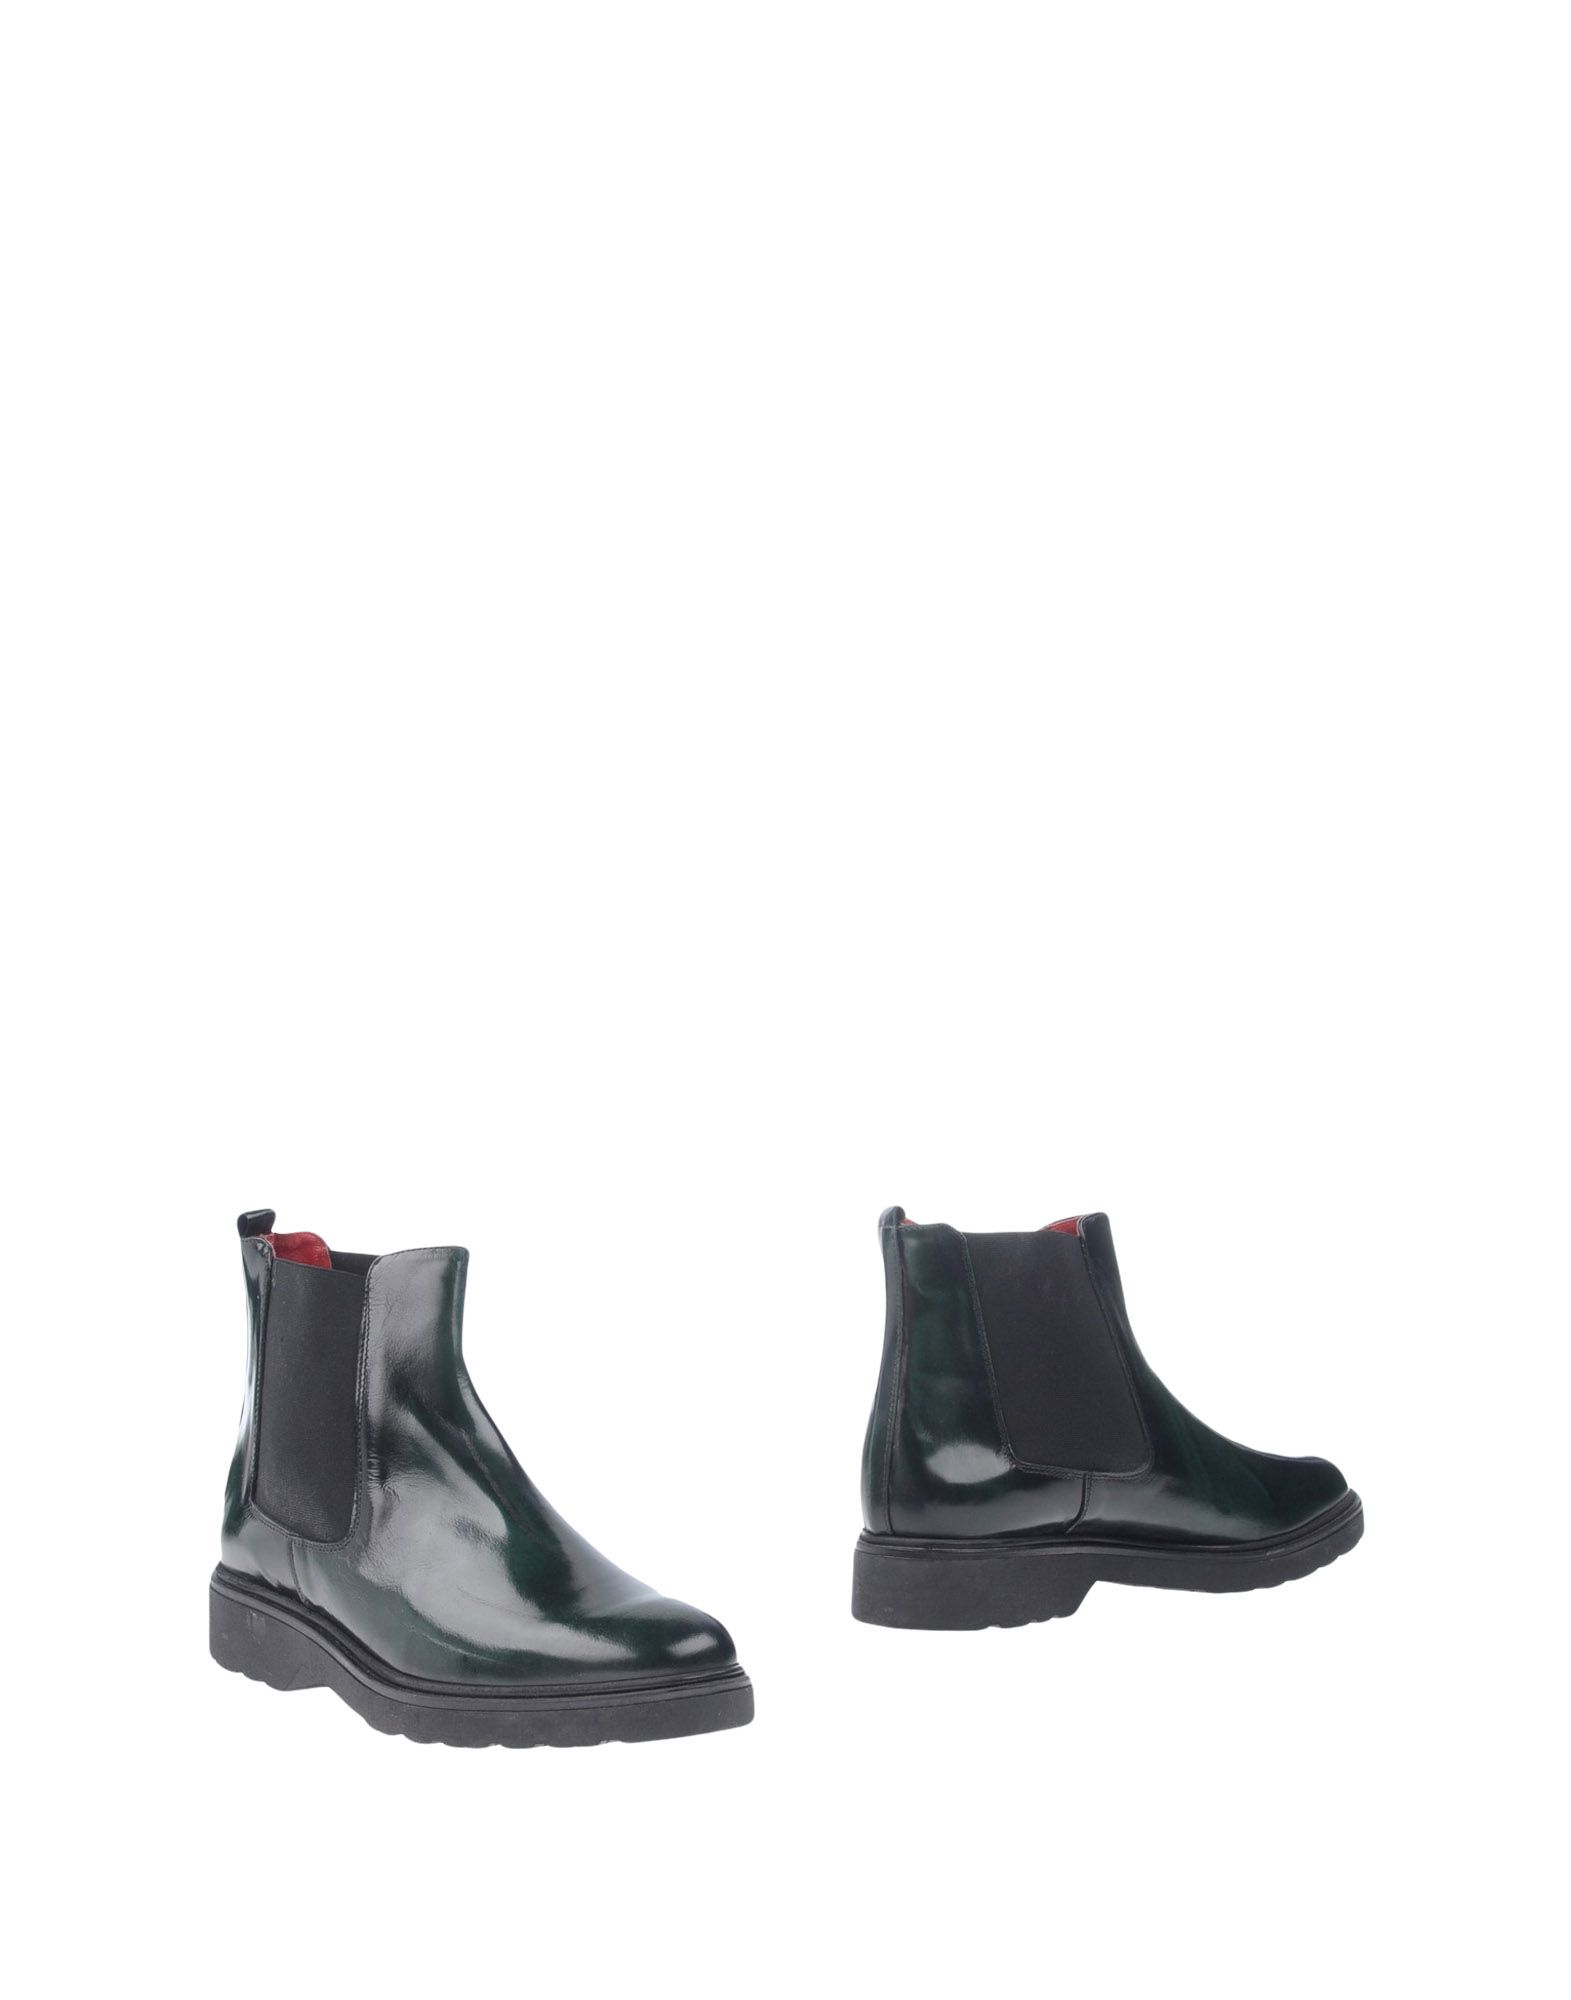 HECON Полусапоги и высокие ботинки magazzini del sale полусапоги и высокие ботинки